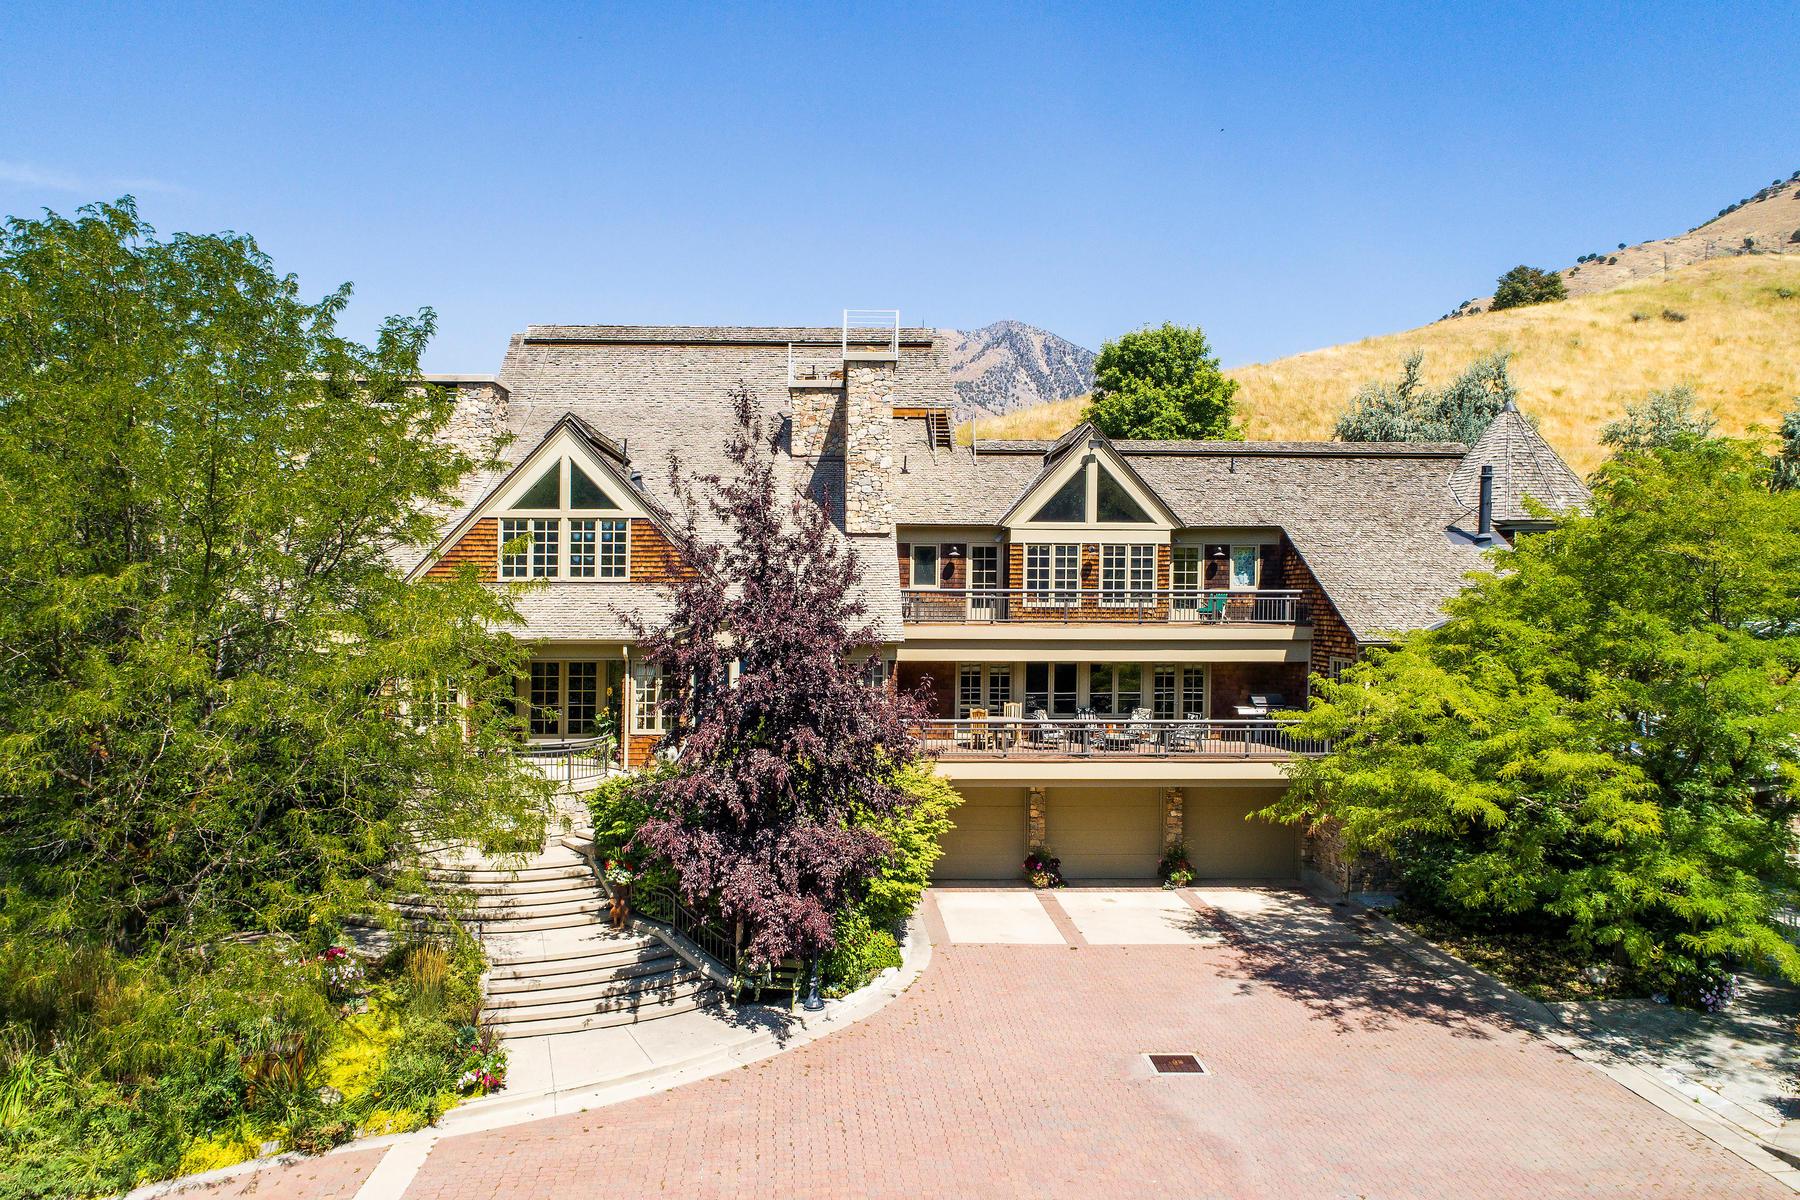 Single Family Homes için Satış at Custom Estate On Nine Acres 245 North 1480 East, Logan, Utah 84323 Amerika Birleşik Devletleri